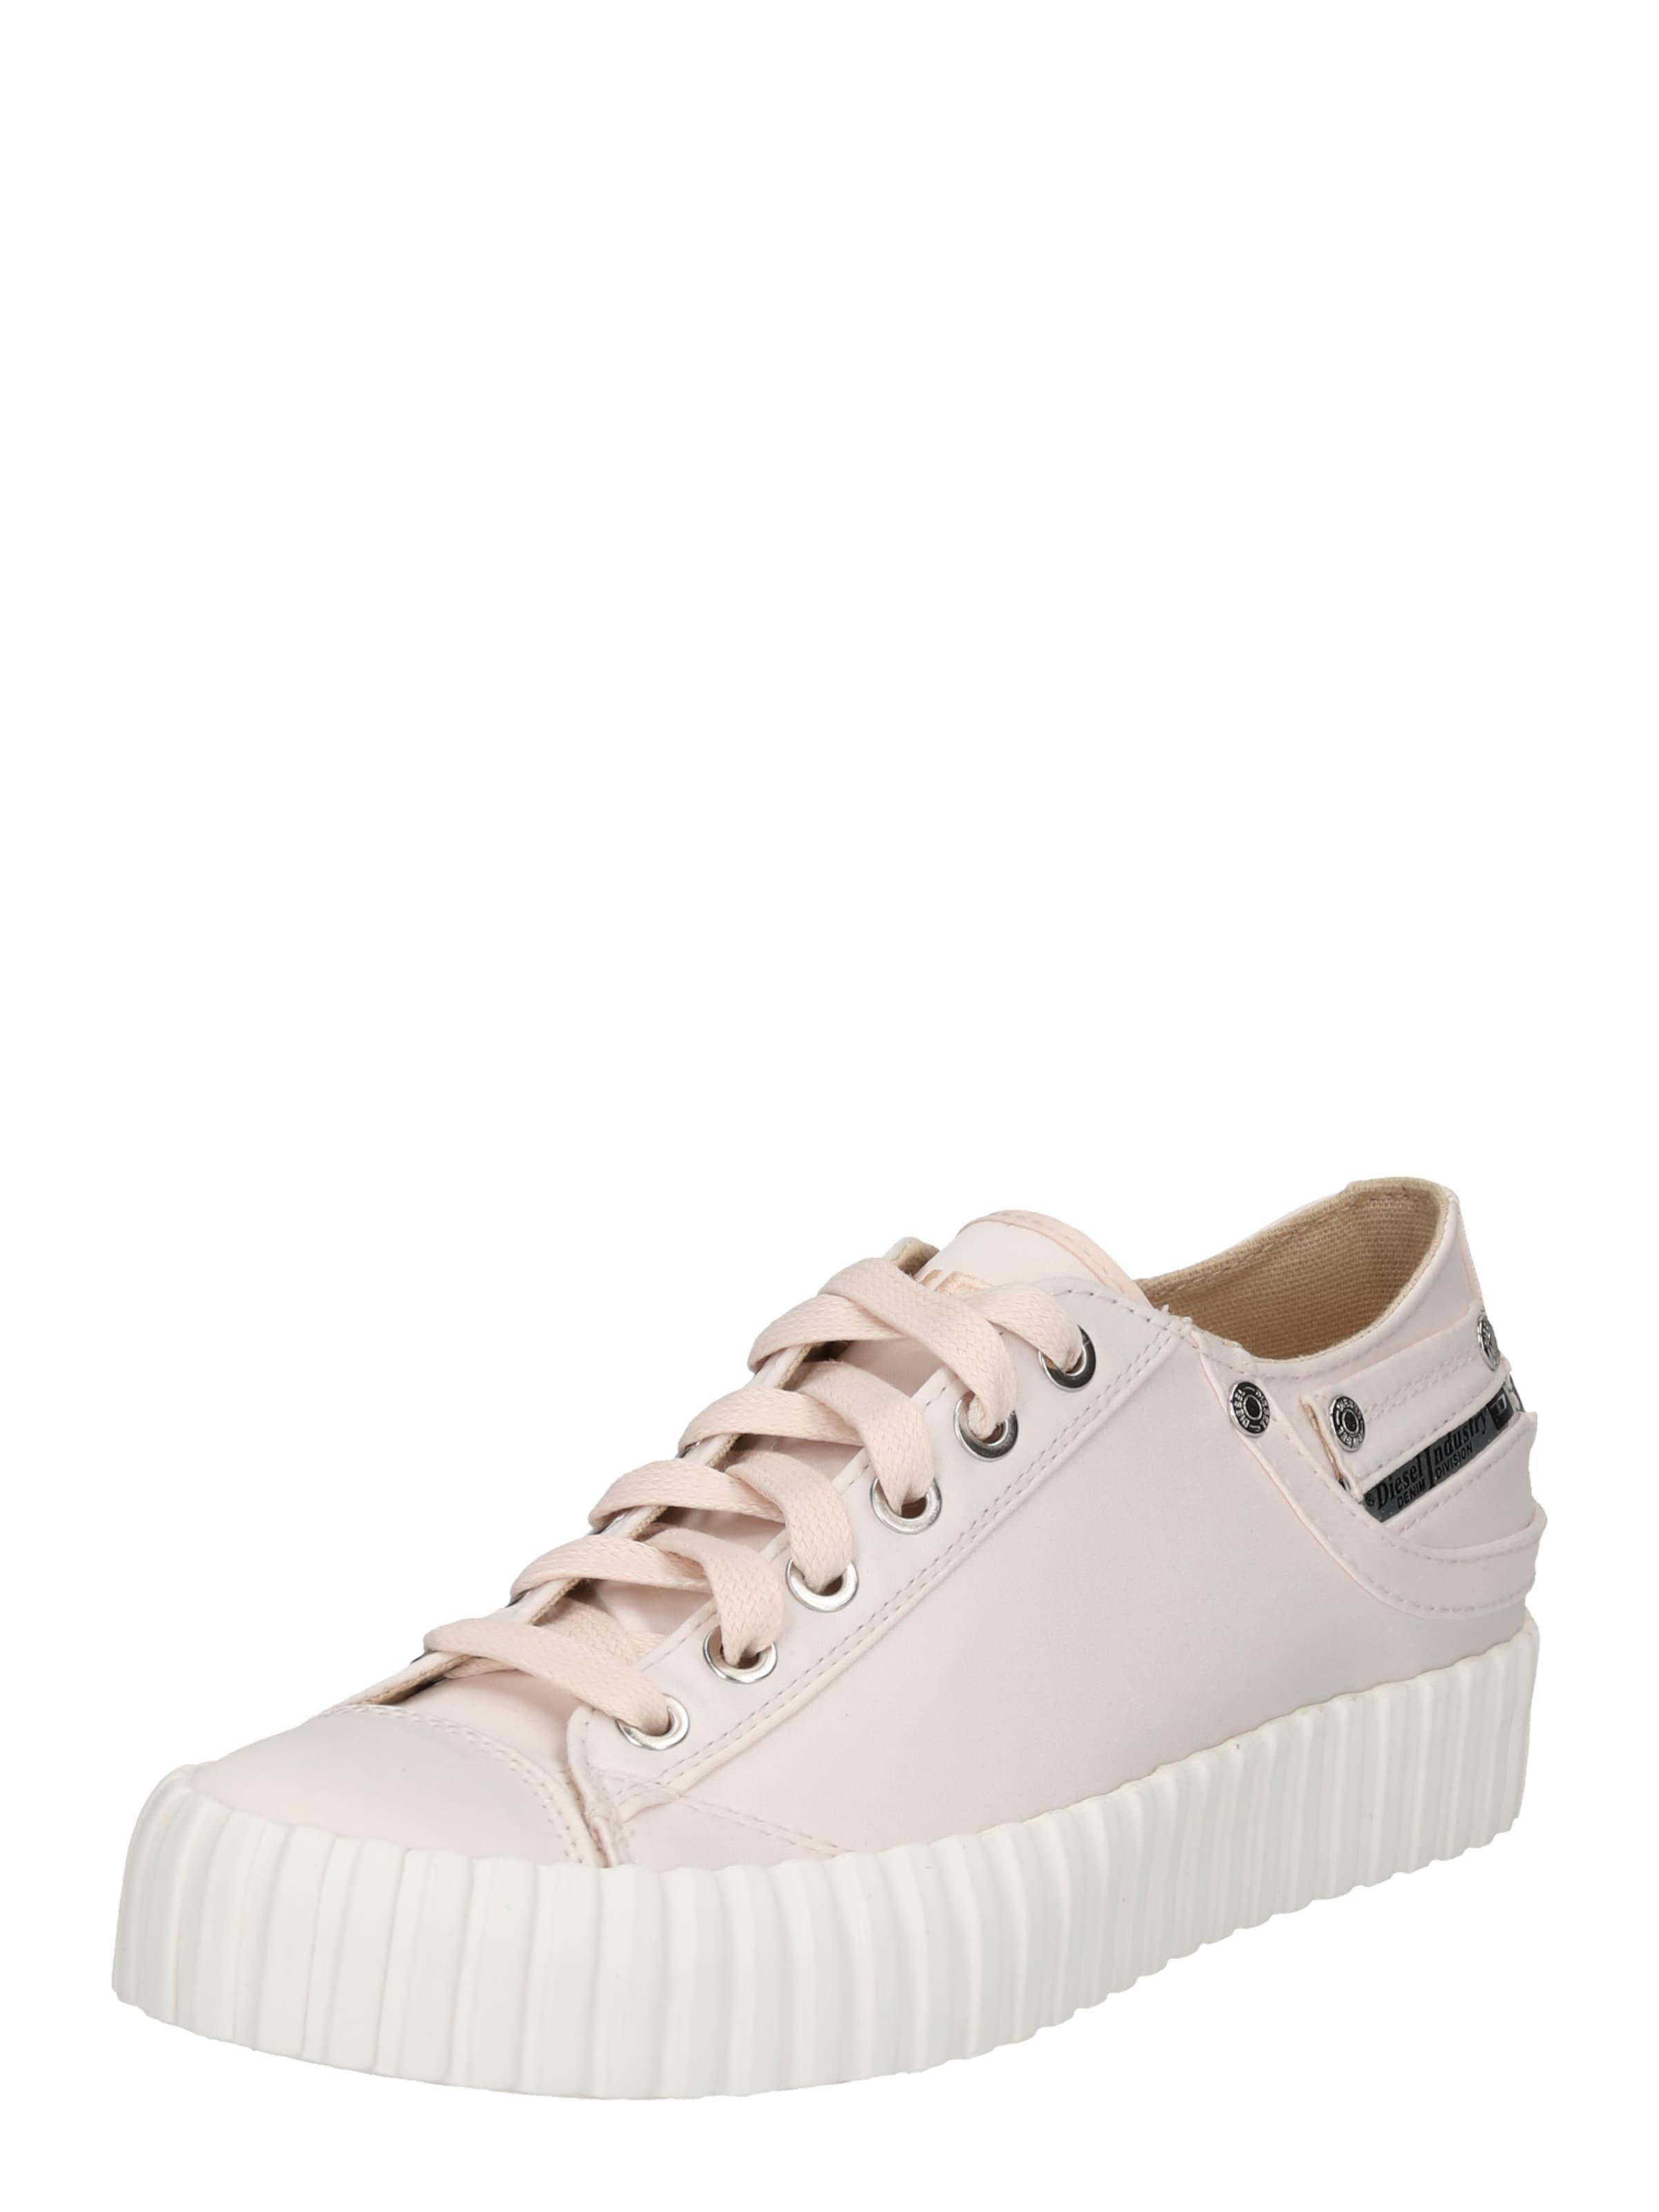 DIESEL Sneaker Low EXPOSURE Verschleißfeste billige Schuhe